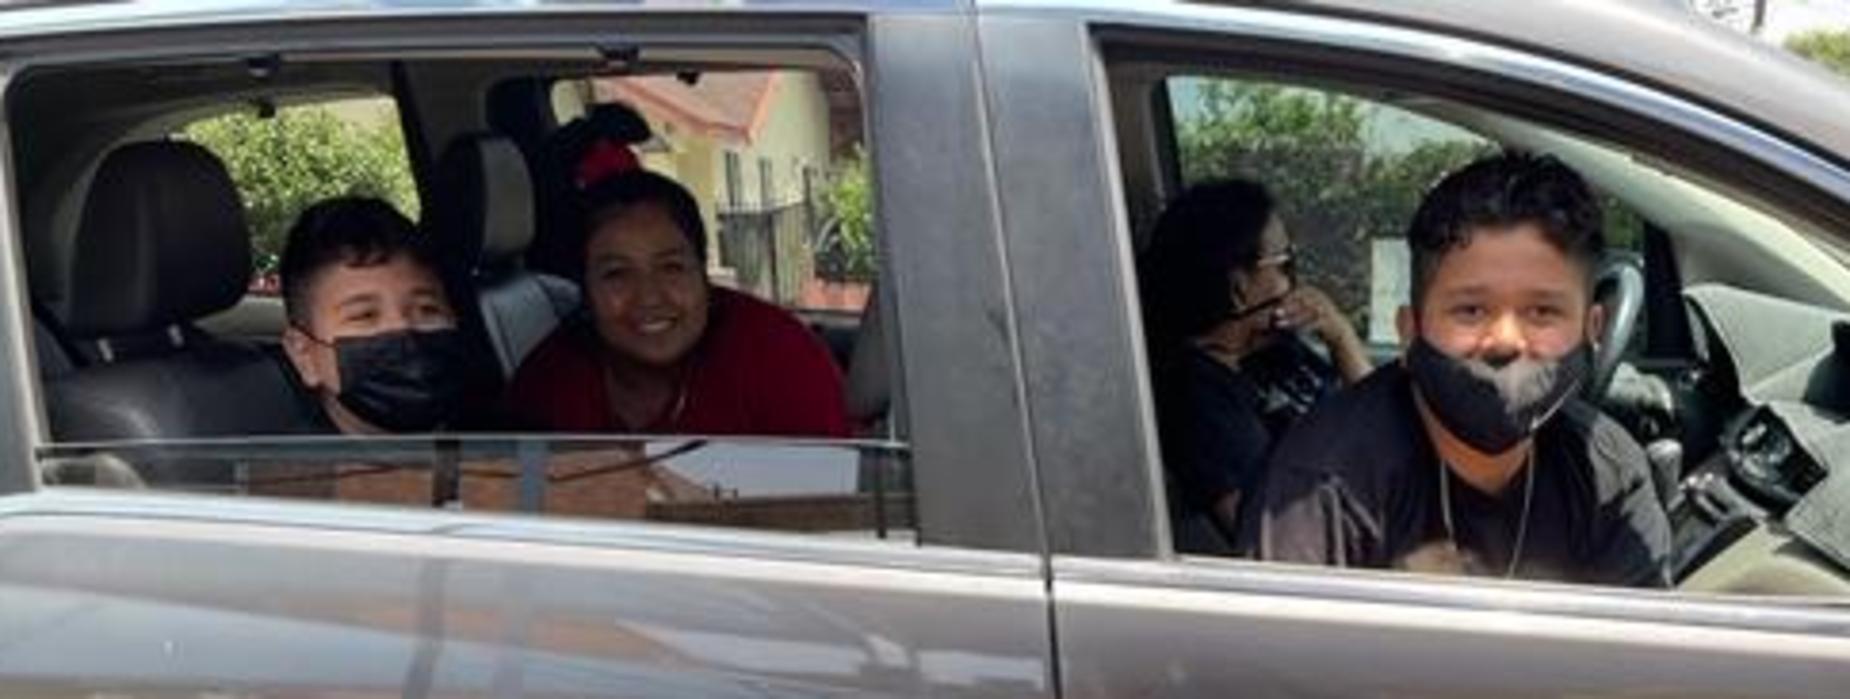 Marguerita students during Drive-Thru event